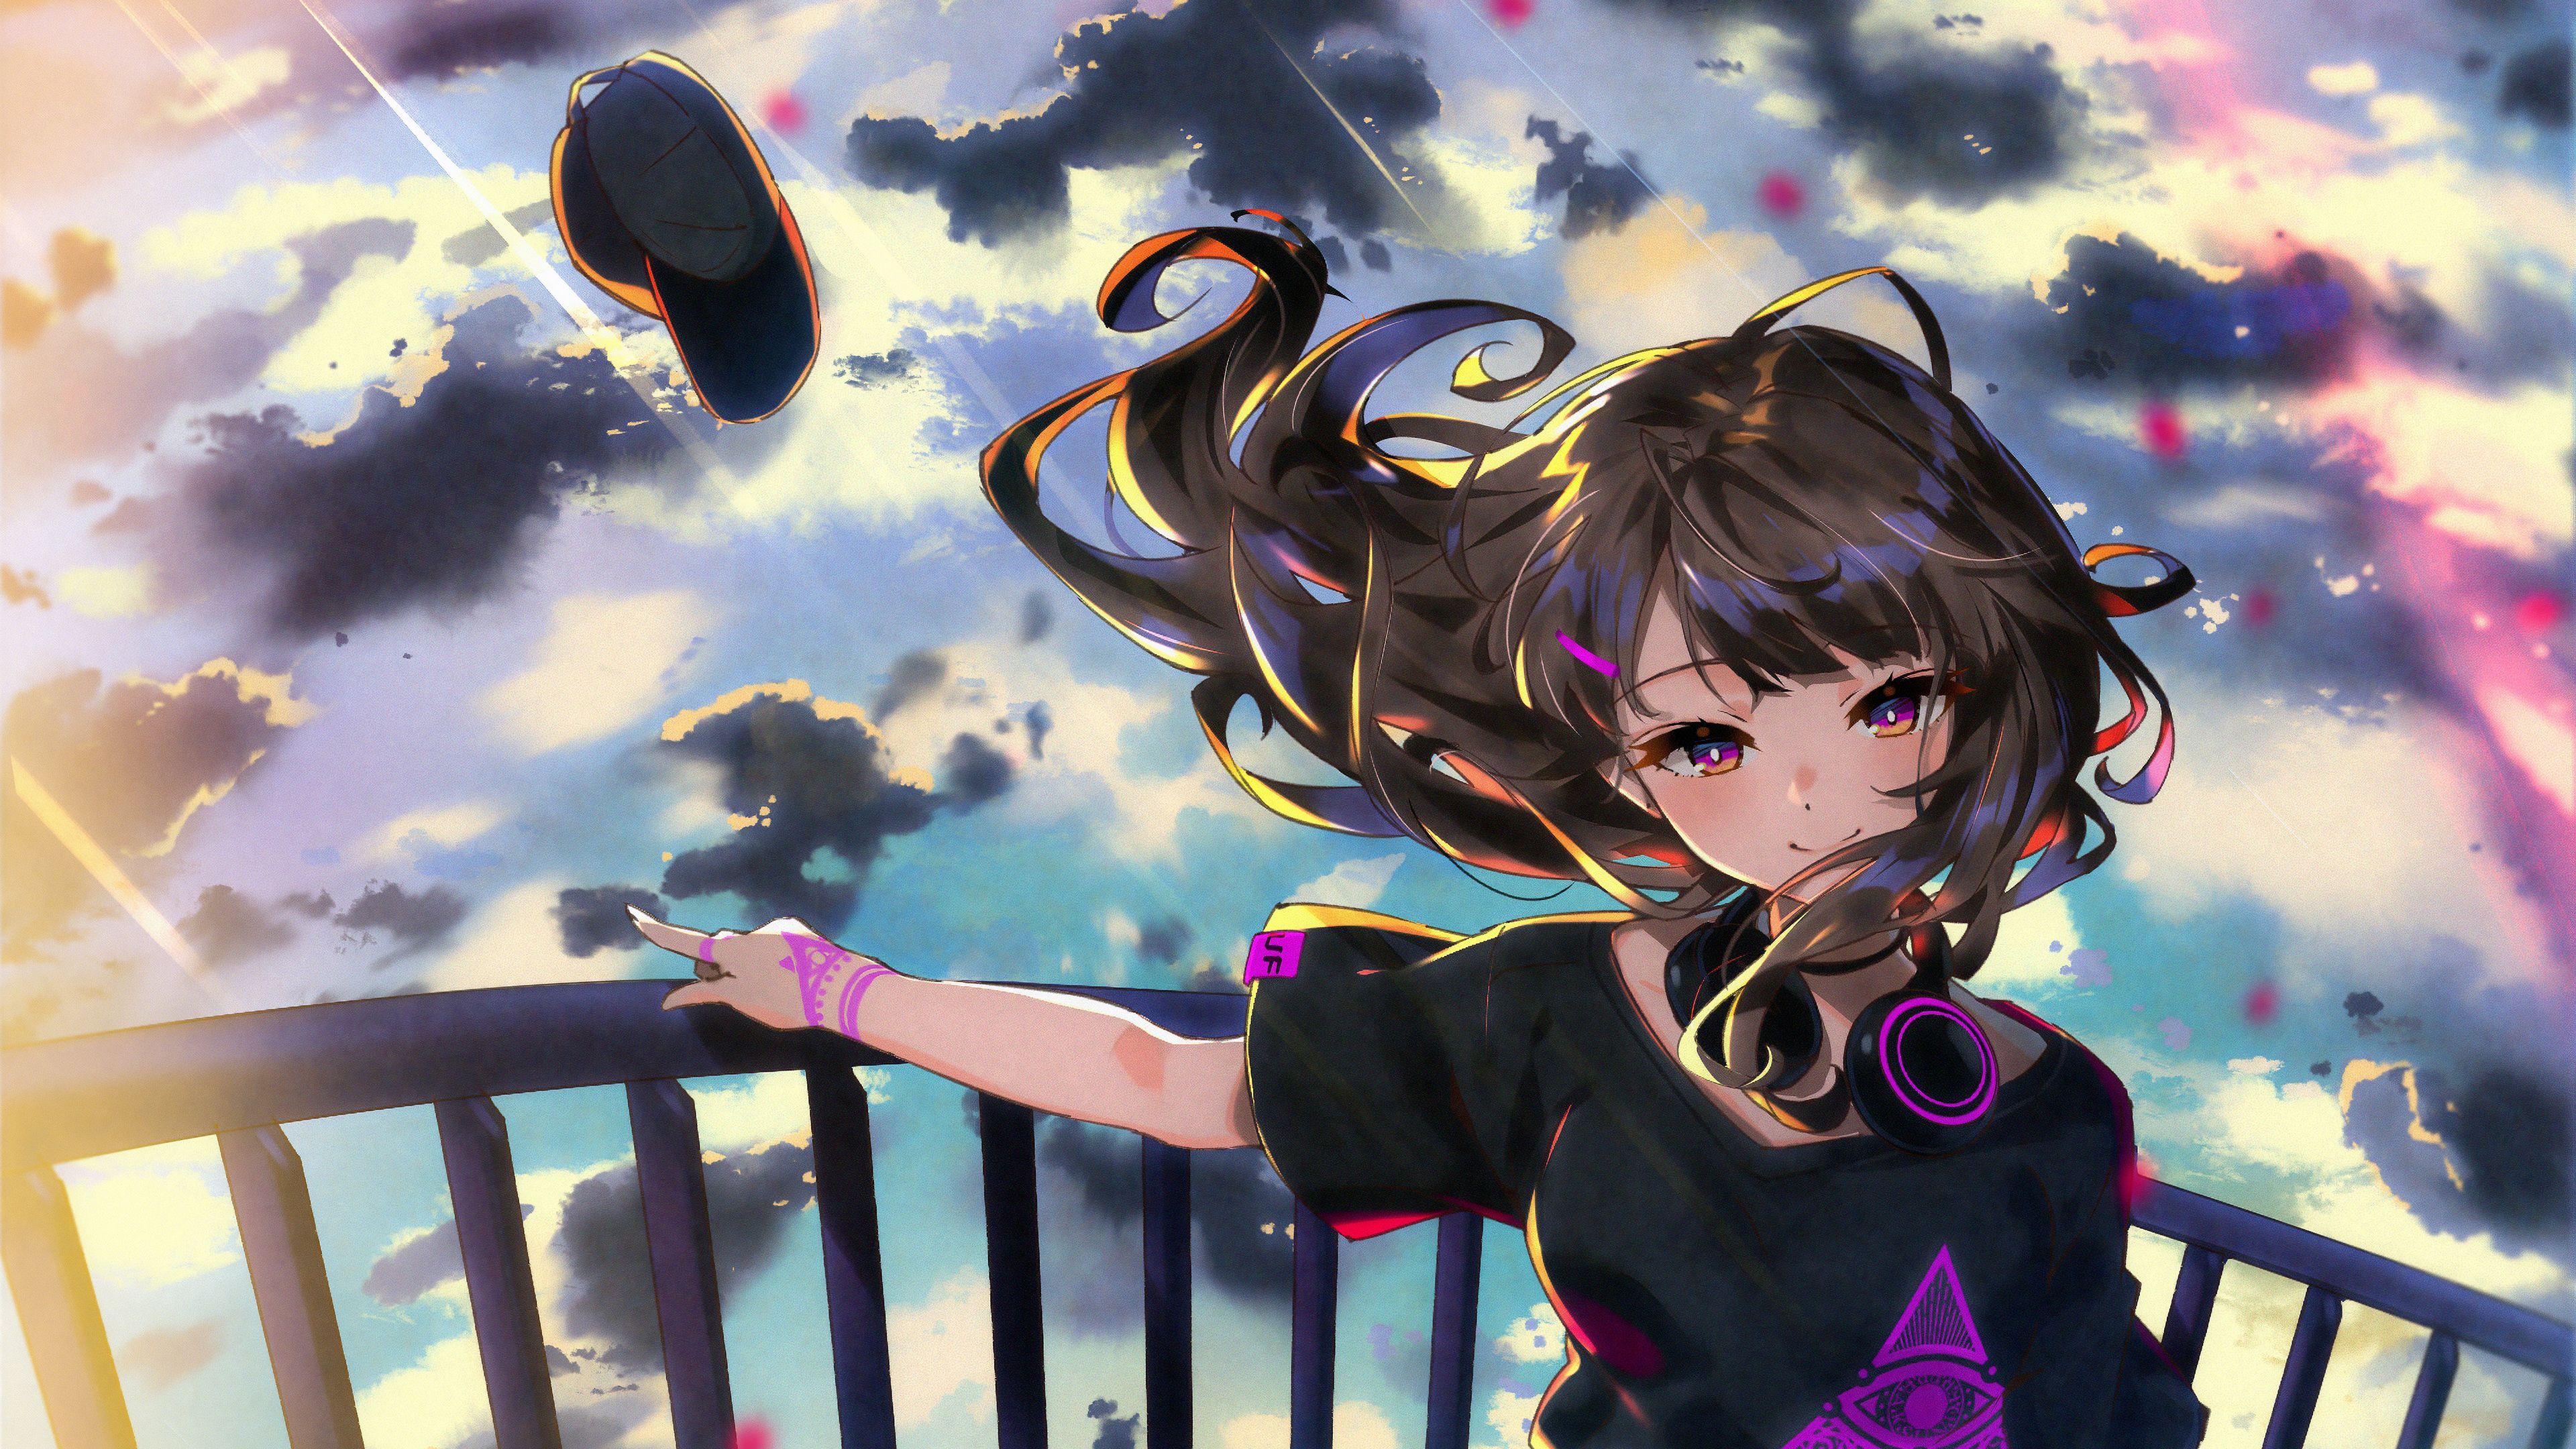 Iabu9tp5qek8rm 21 anime wallpaper 4k